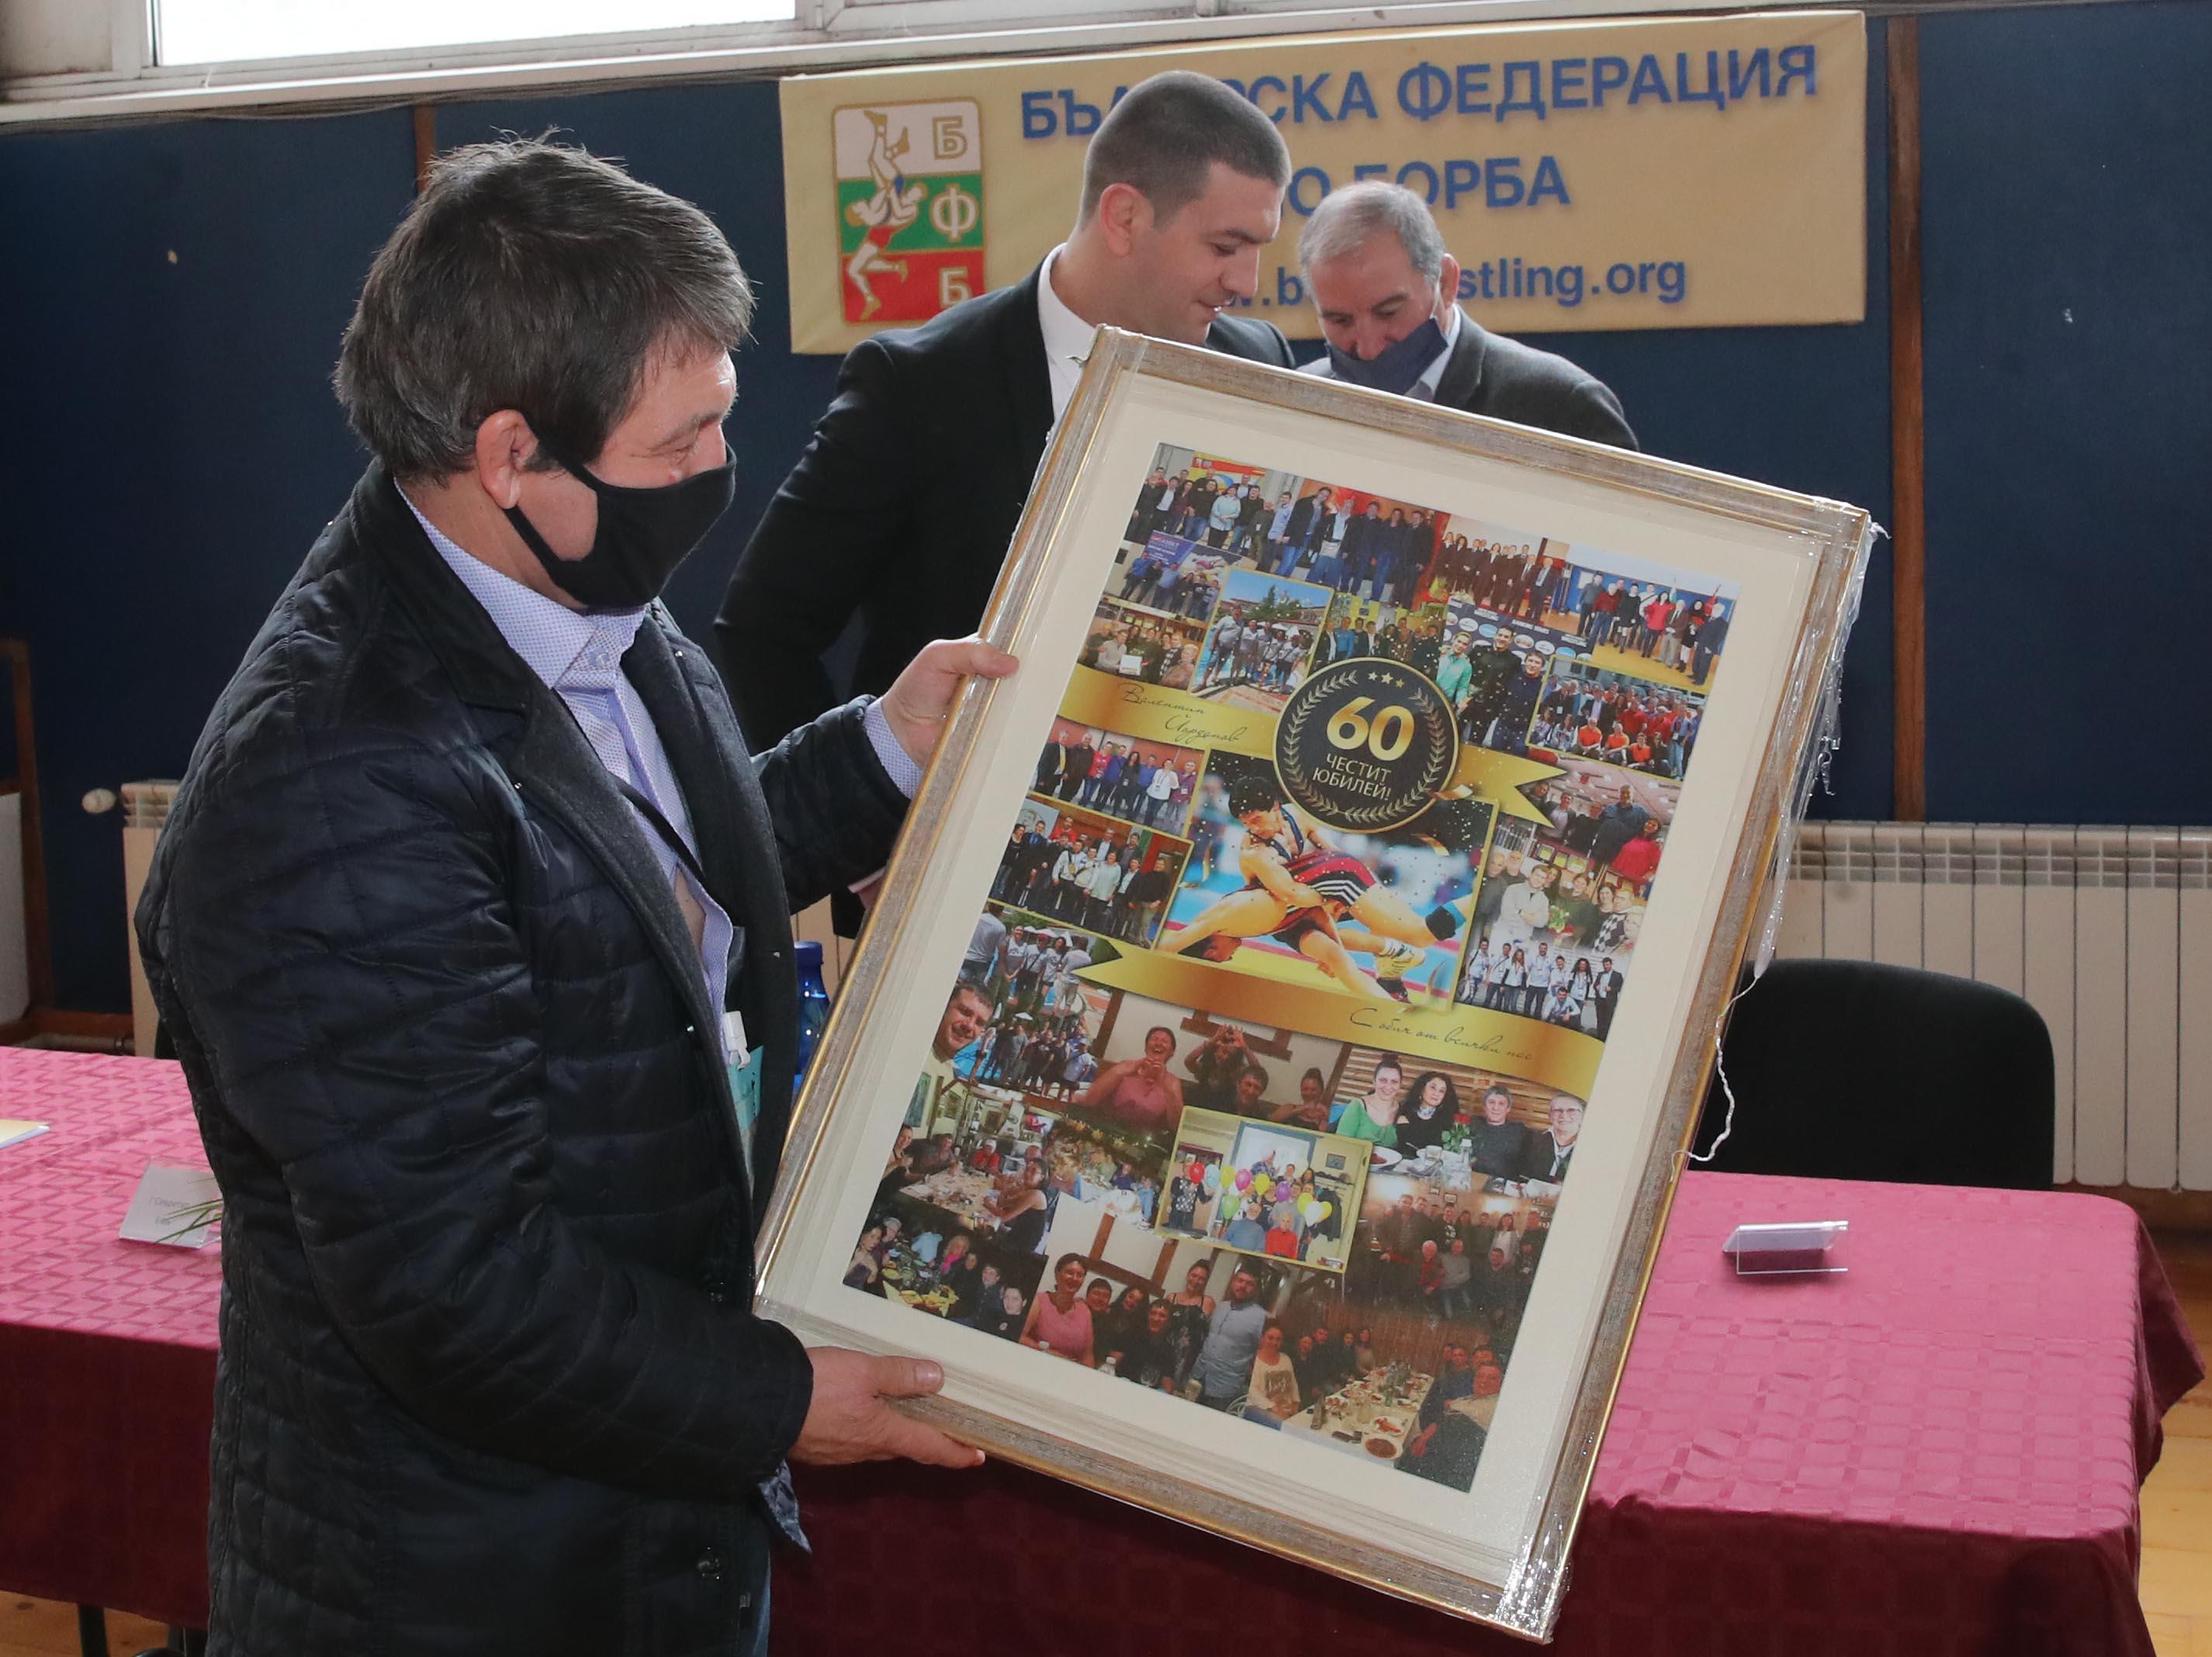 Валентин Йорданов1